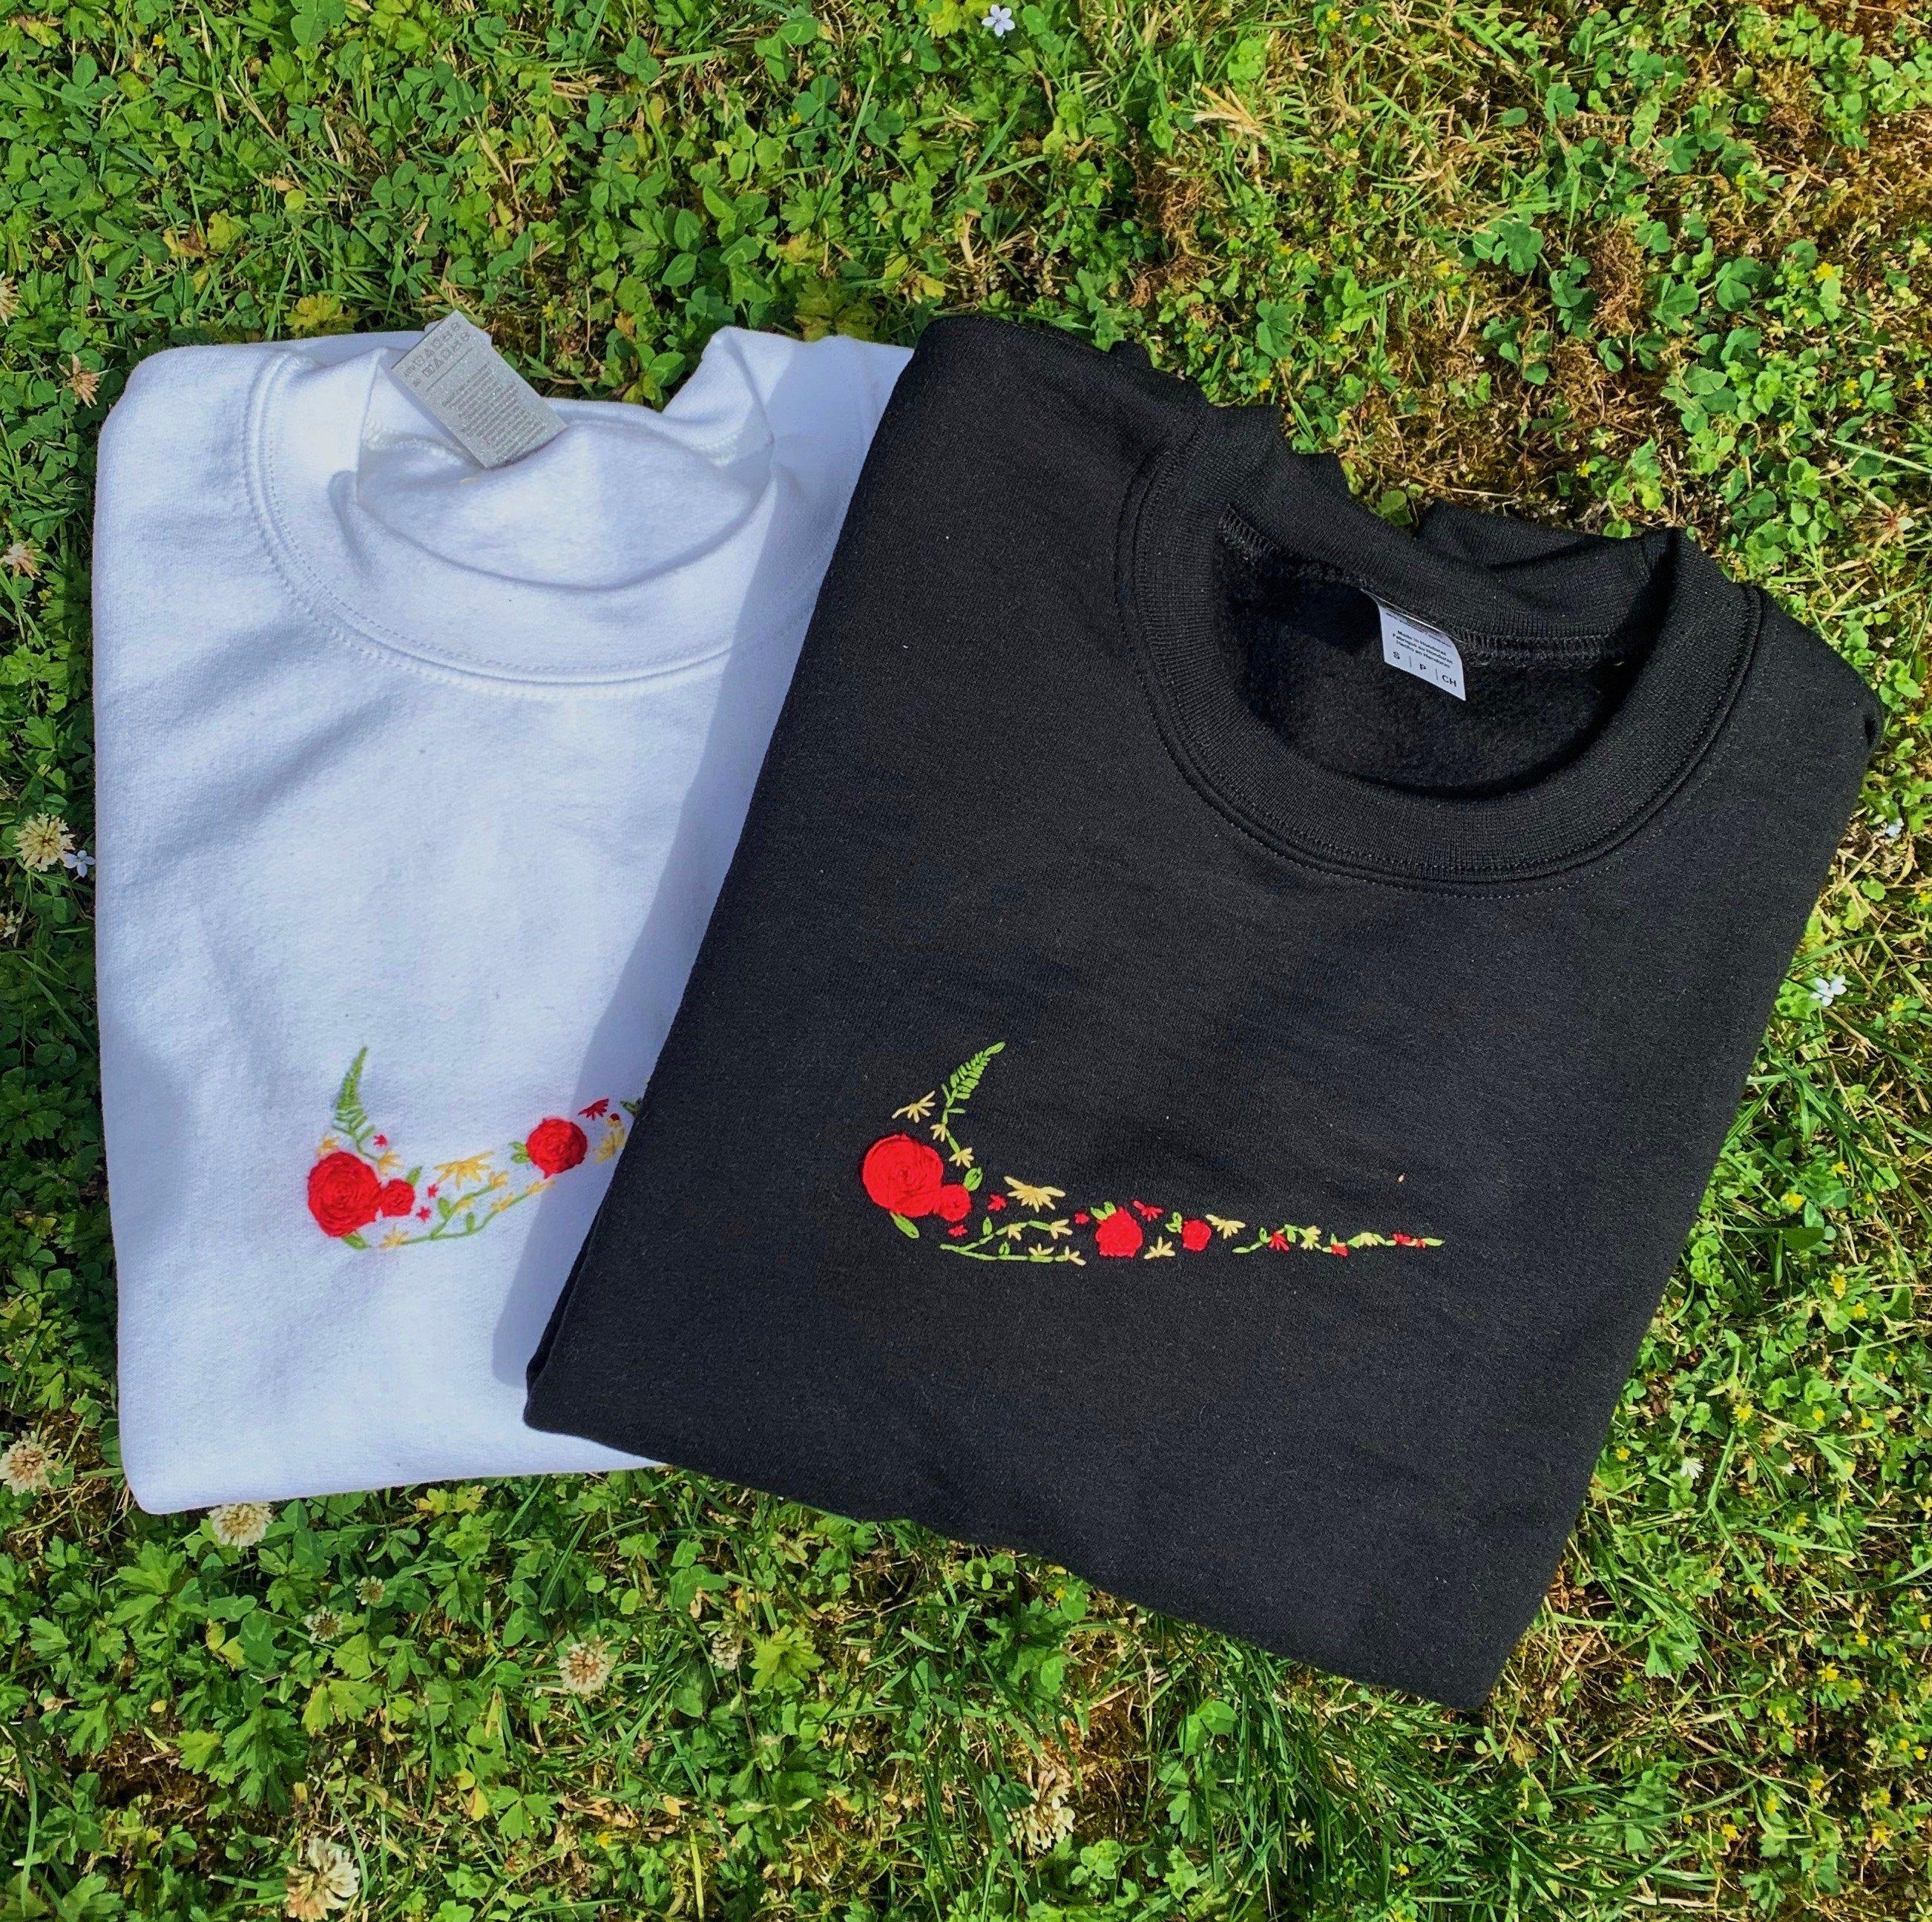 Custom Nike Embroidered Sweatshirt By Boardwalkembroidery On Etsy In 2021 Embroidered Sweatshirts Embroidery Hoodie Sweatshirts [ 2591 x 2604 Pixel ]